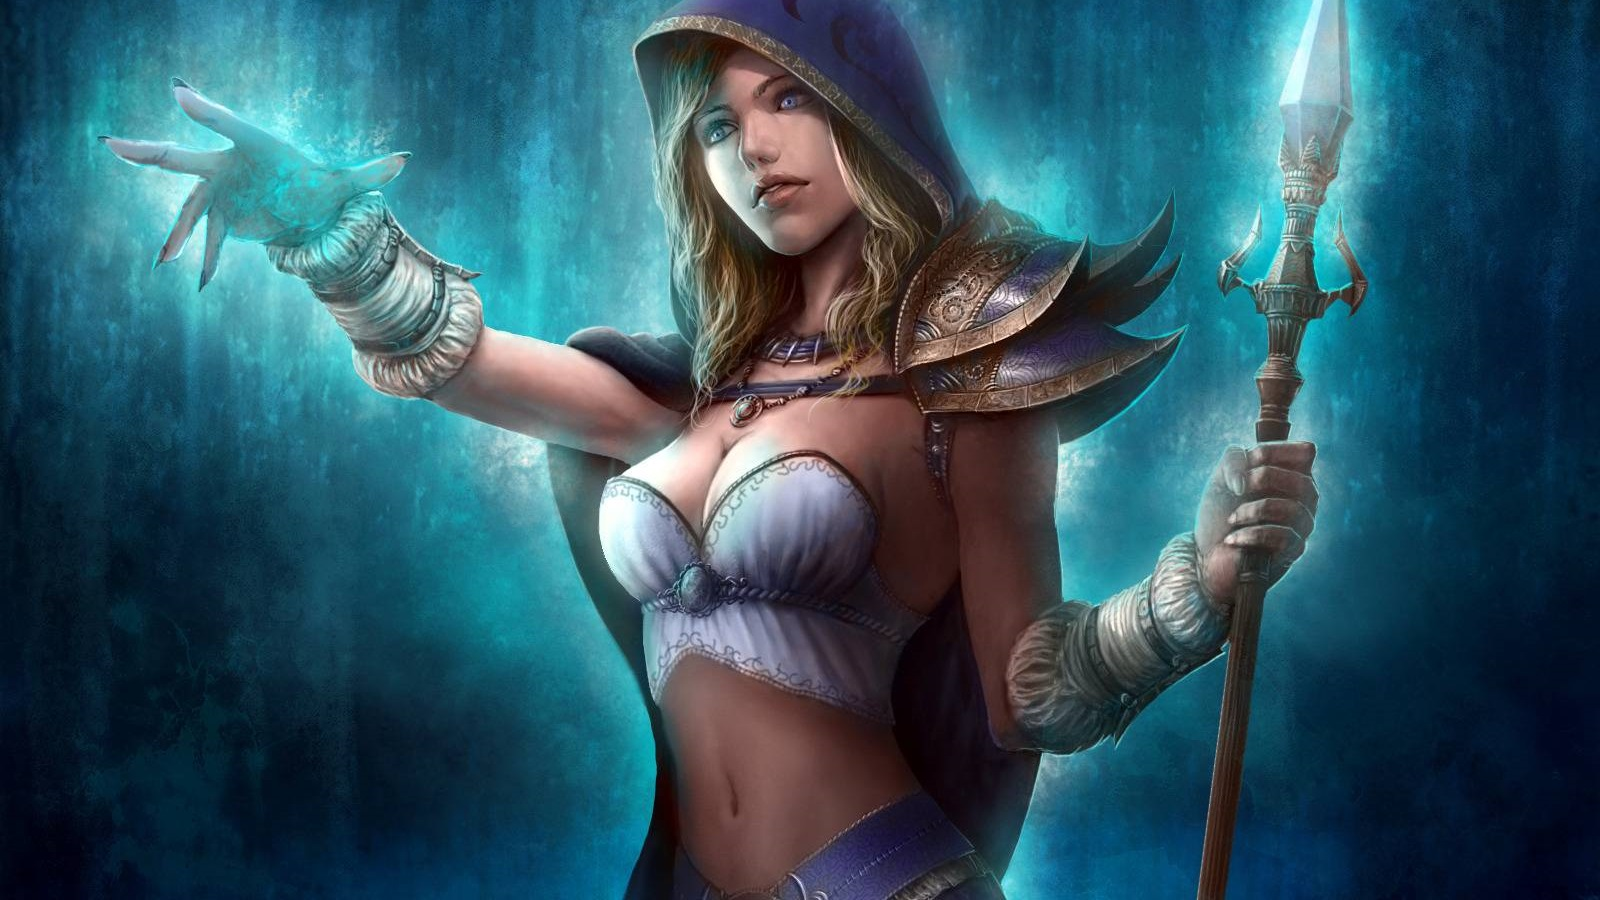 Warcraft 3 nude porn sexy photo